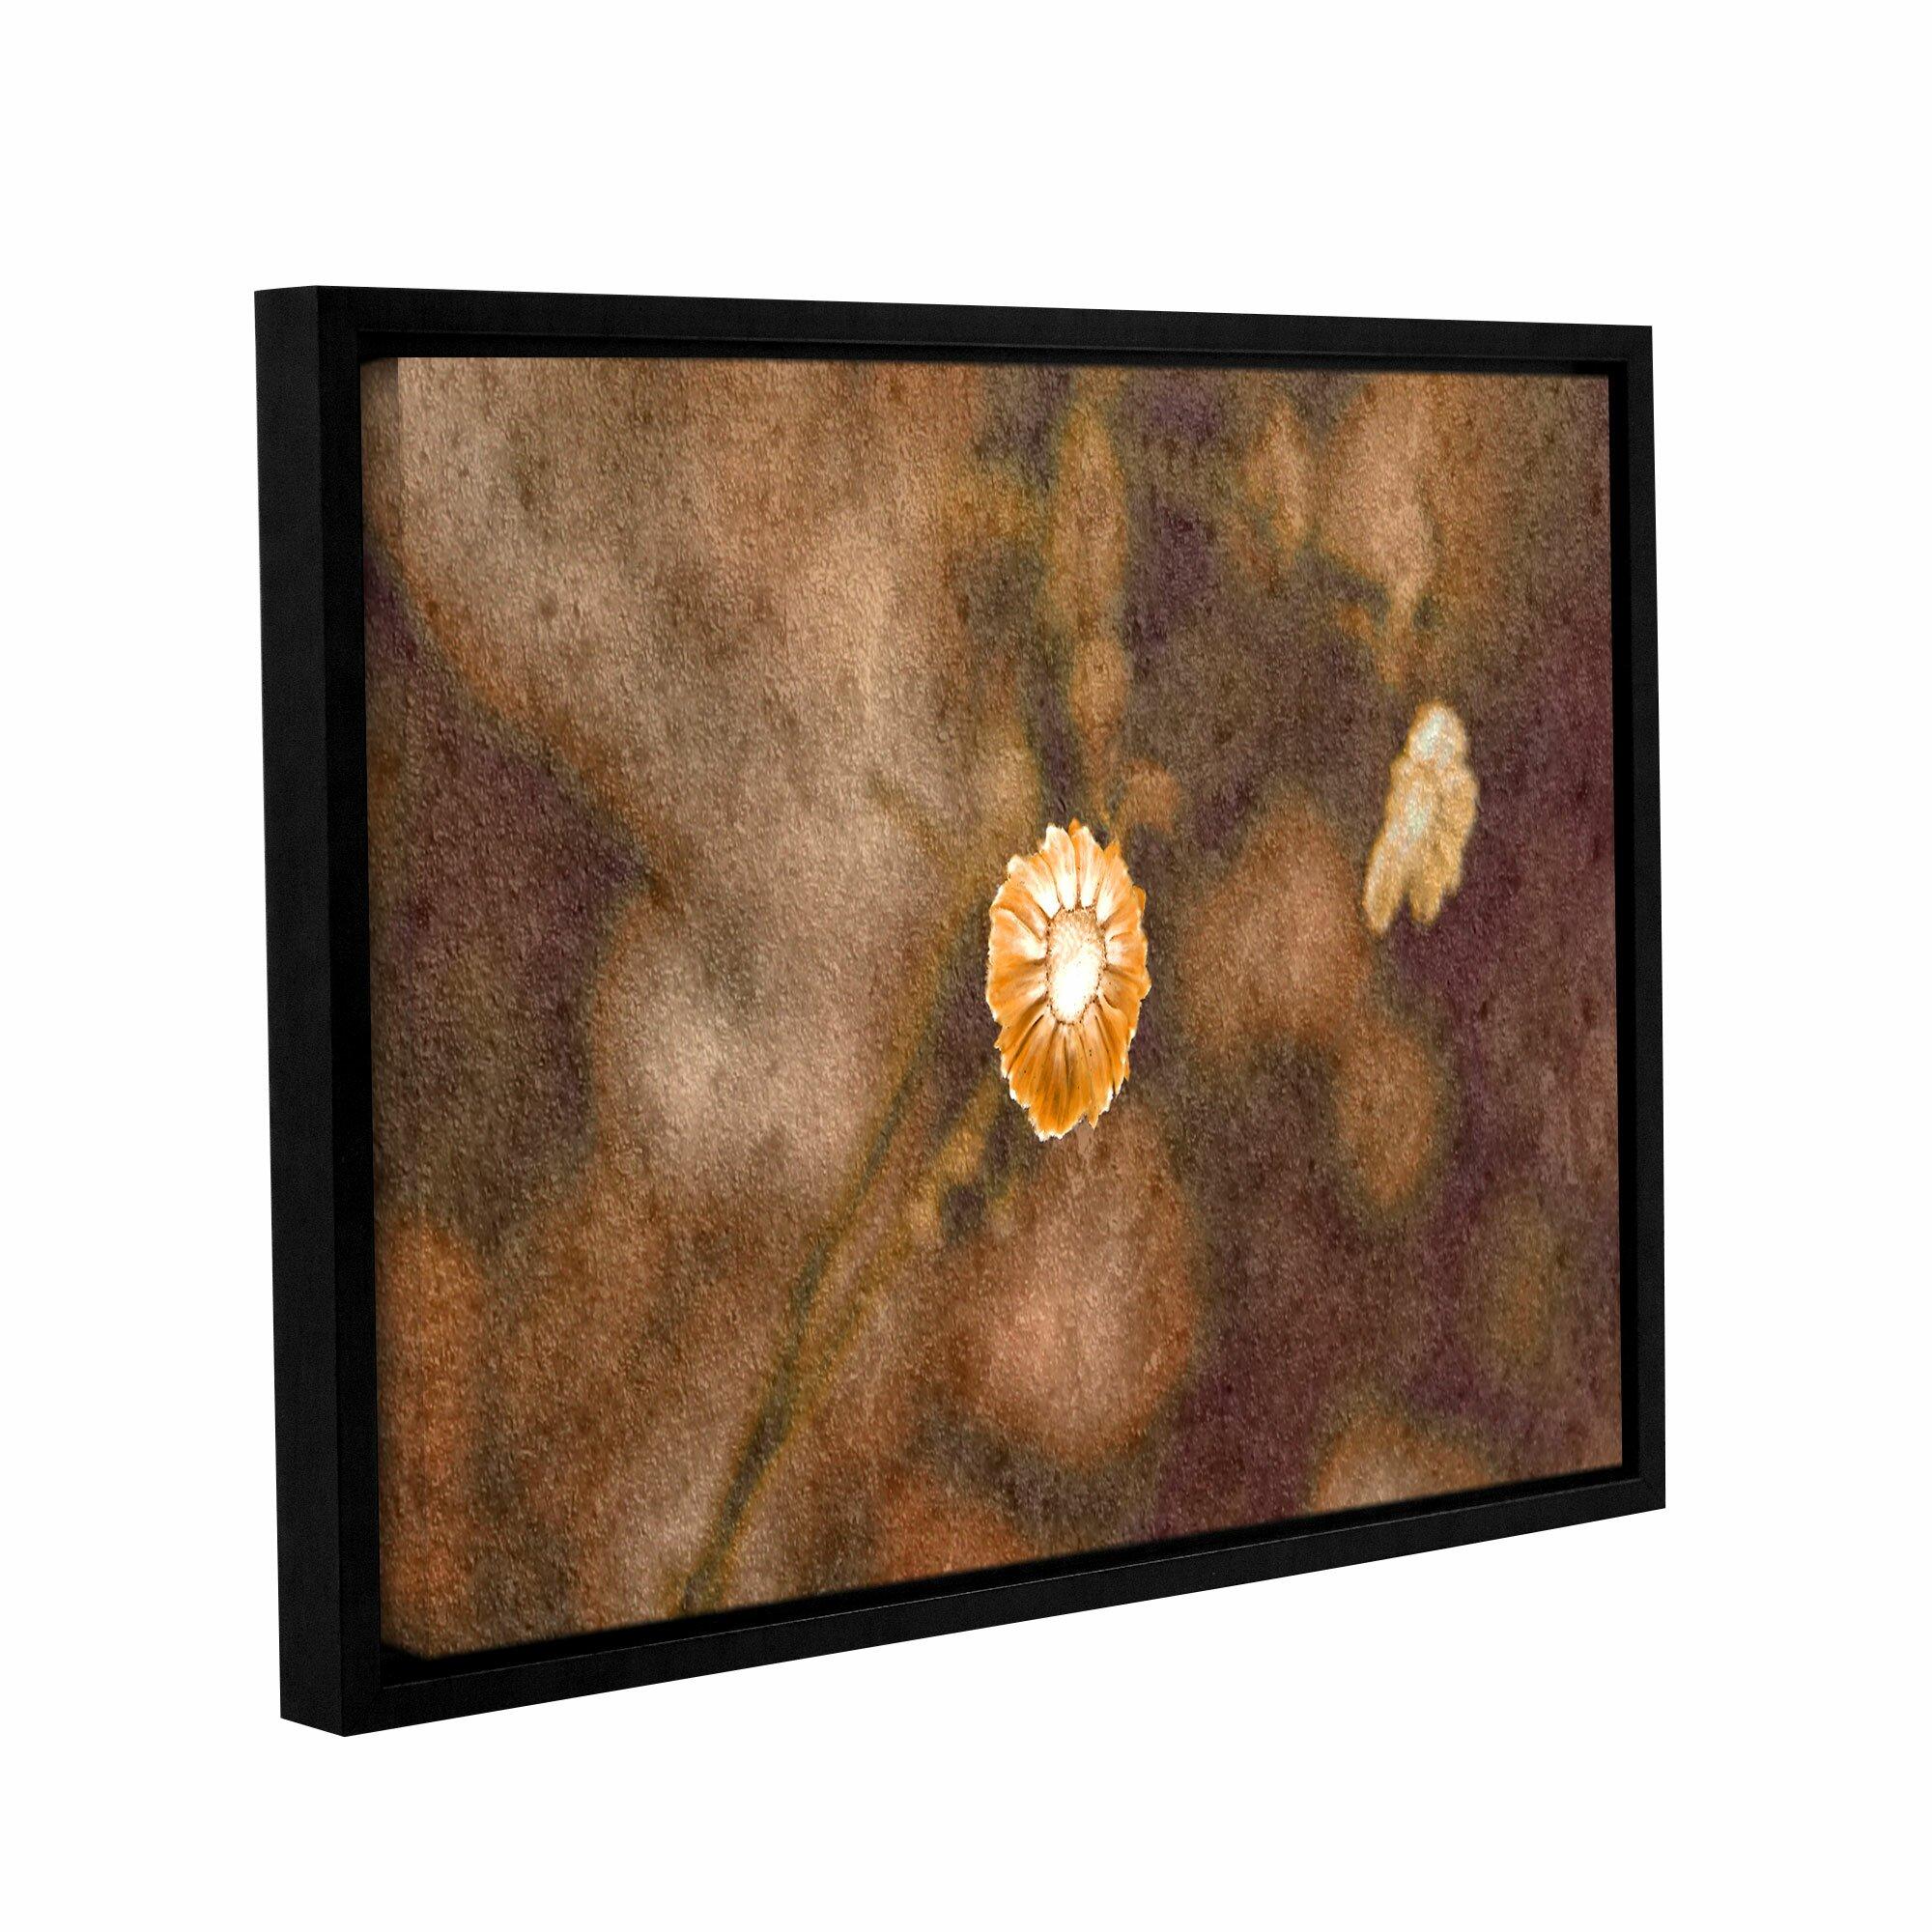 Wall Decor Ross : Center of attention by mark ross framed graphic art wayfair